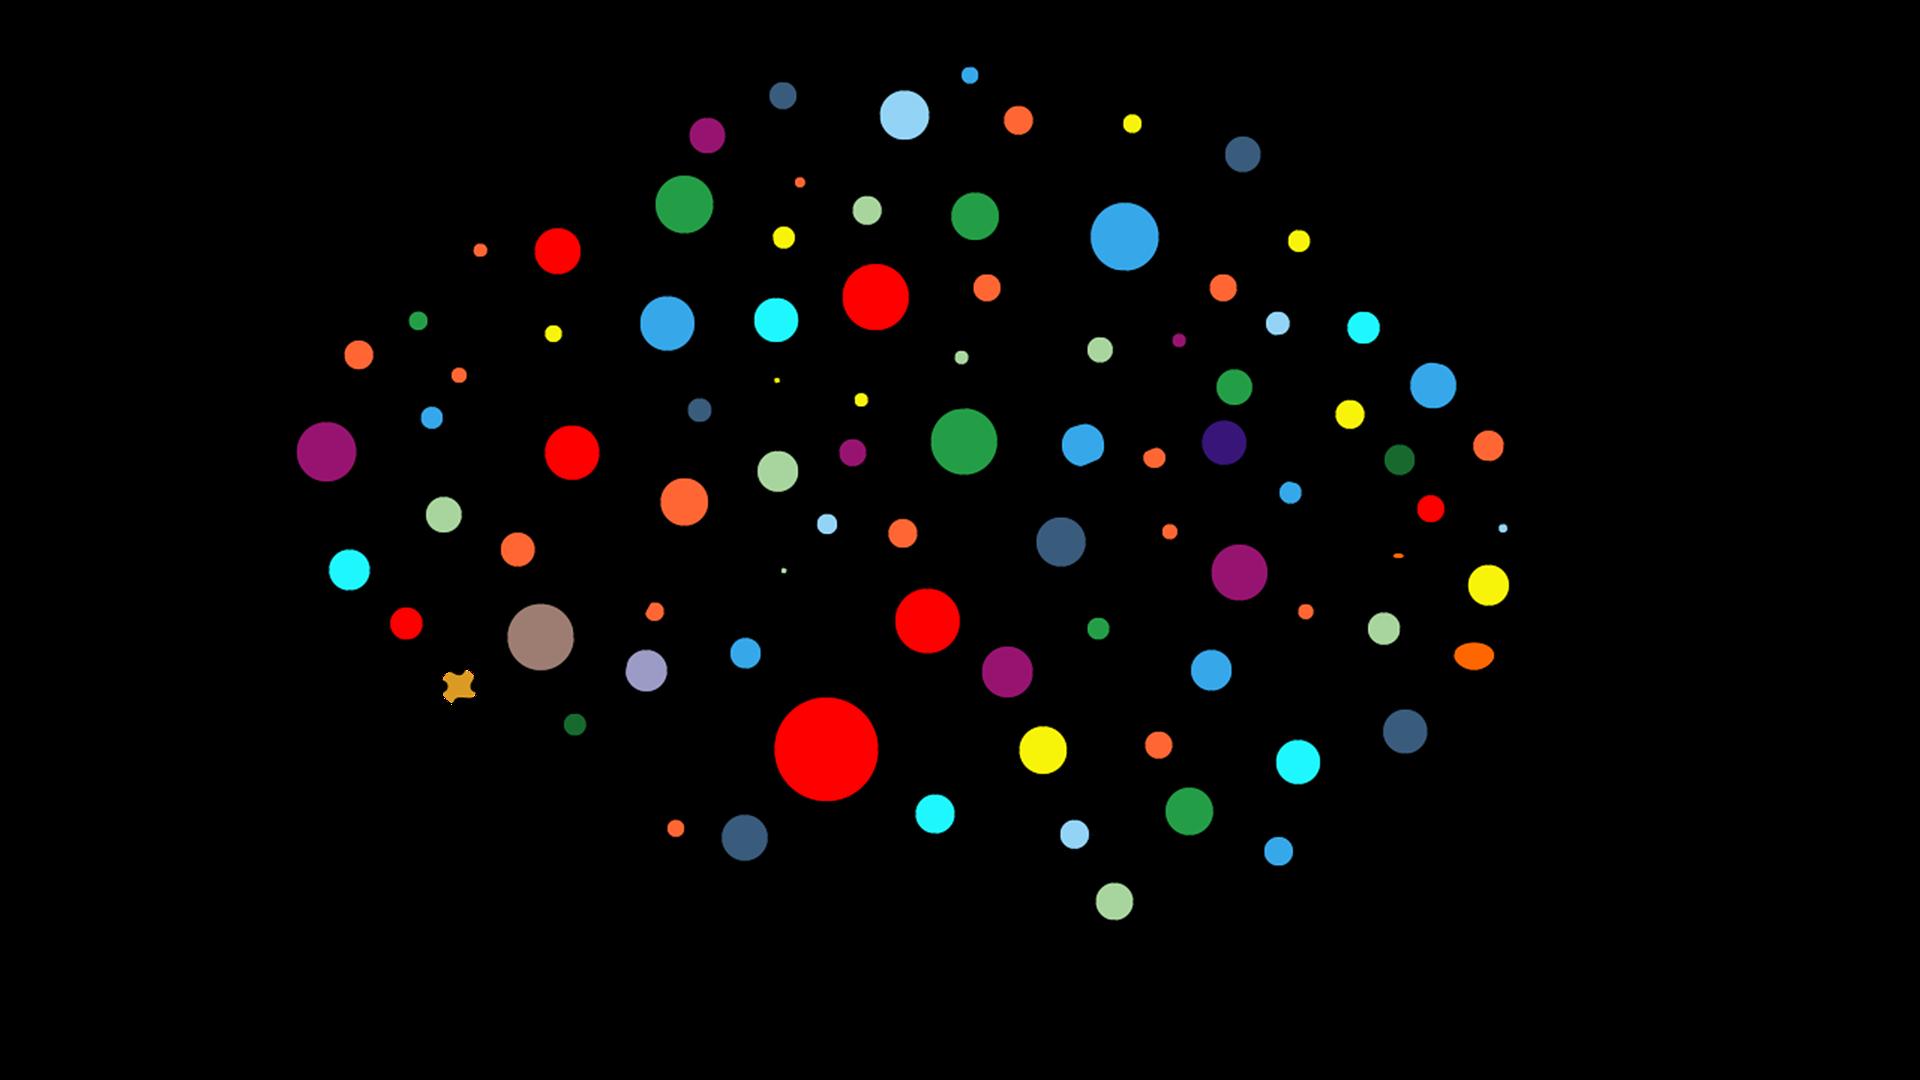 artificial-neural-network-3501528_1920.png